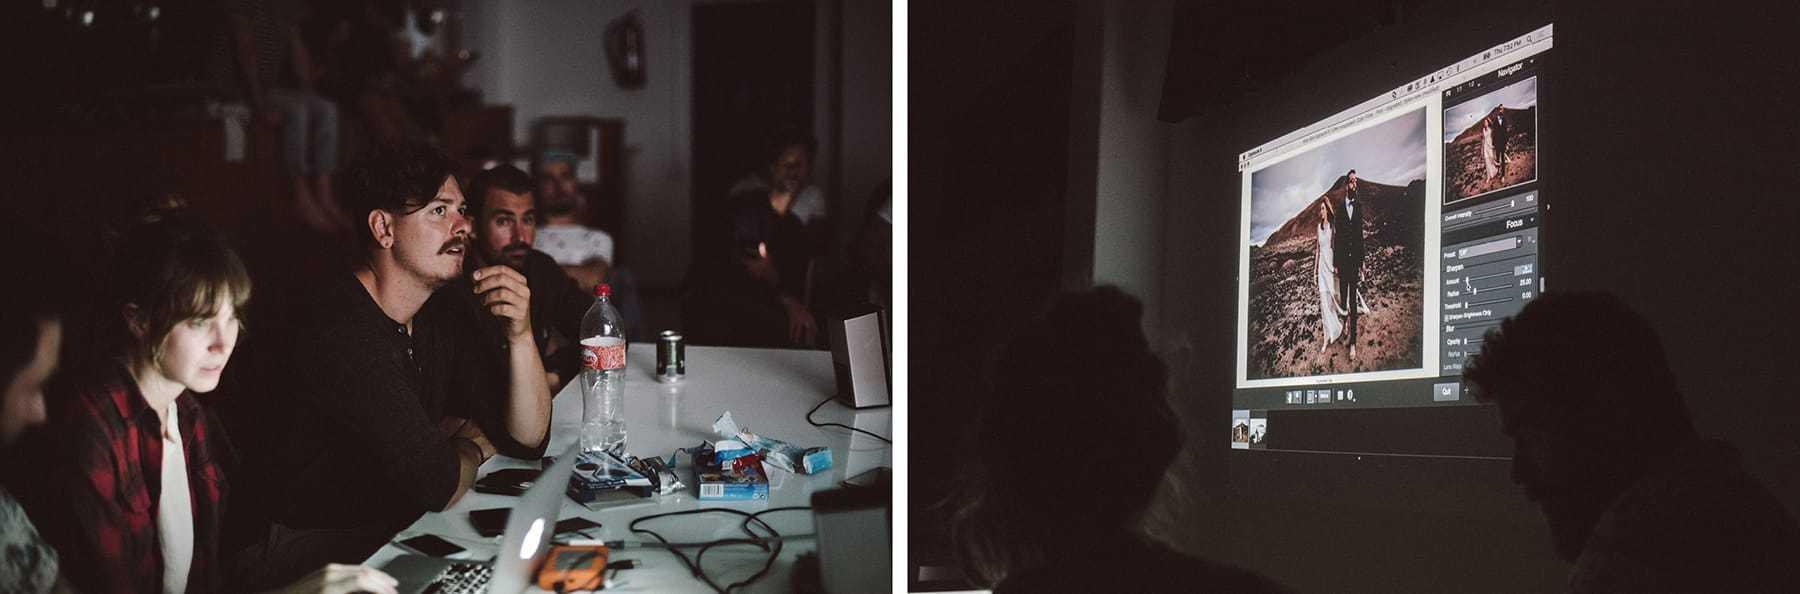 wolves_workshop_hilario_sanchez_fotografo_boda_españa_509